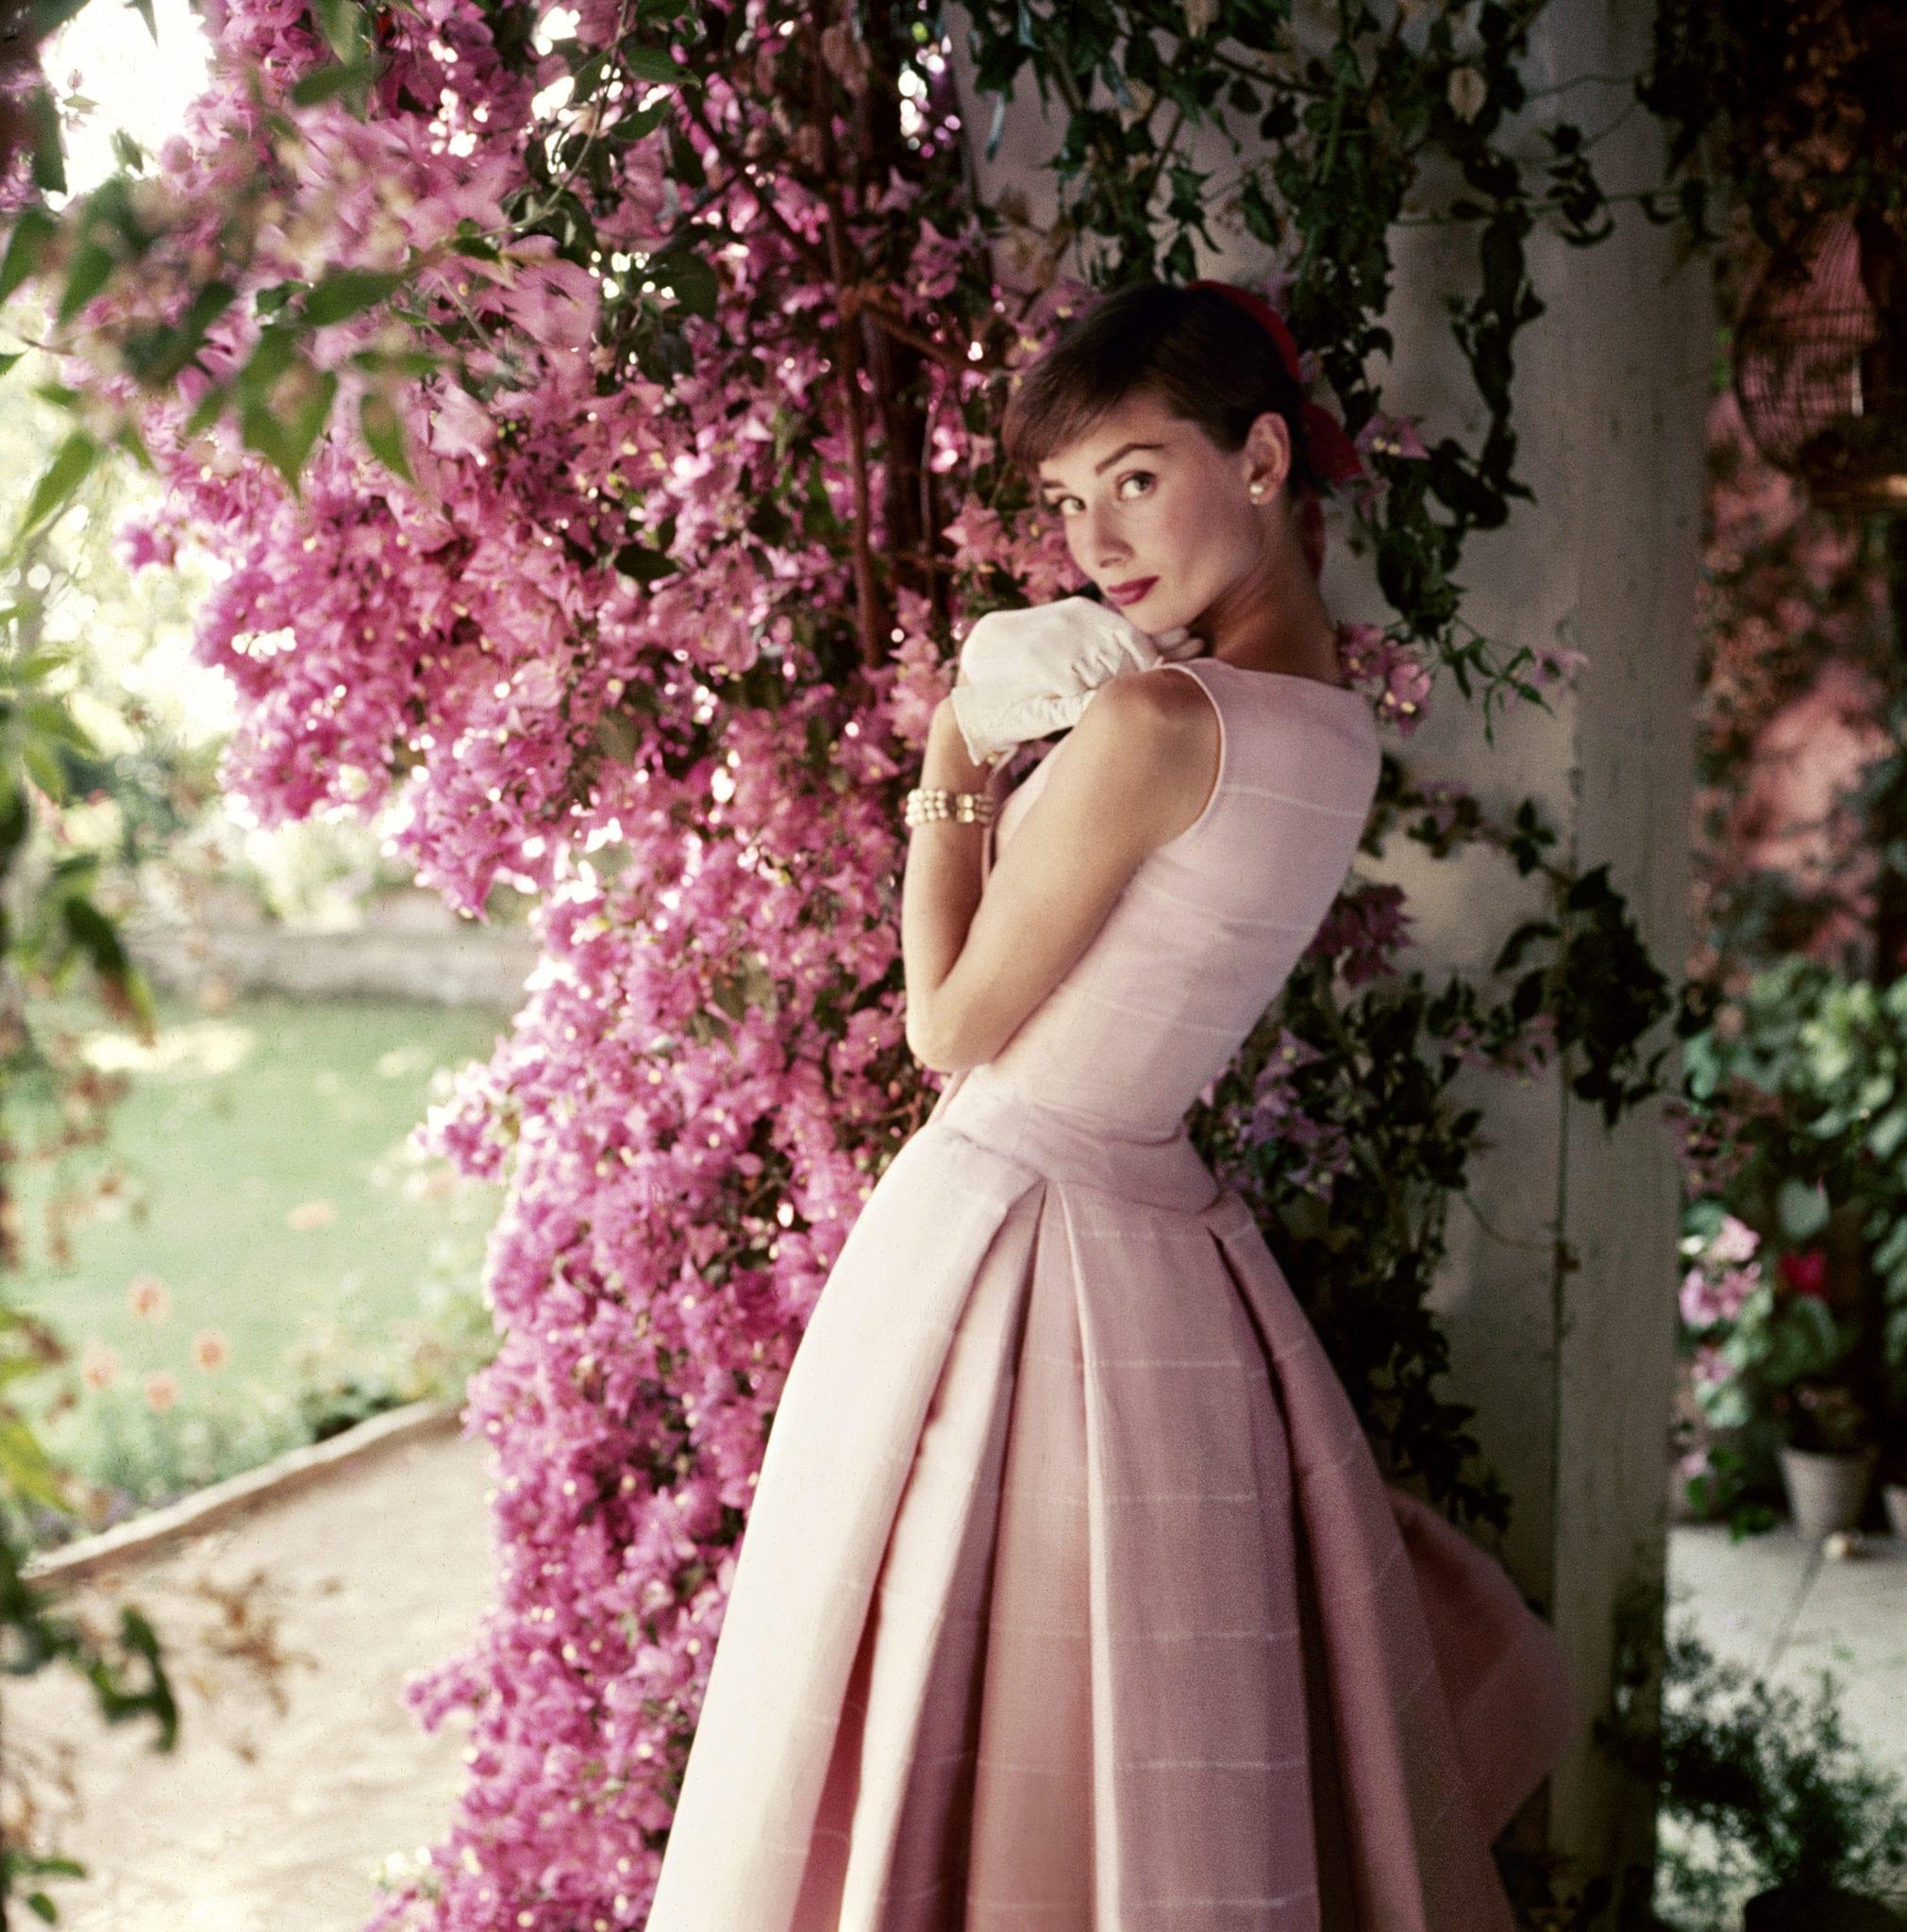 2 Audrey Hepburn Pink Dress Flowers The Glam Pad